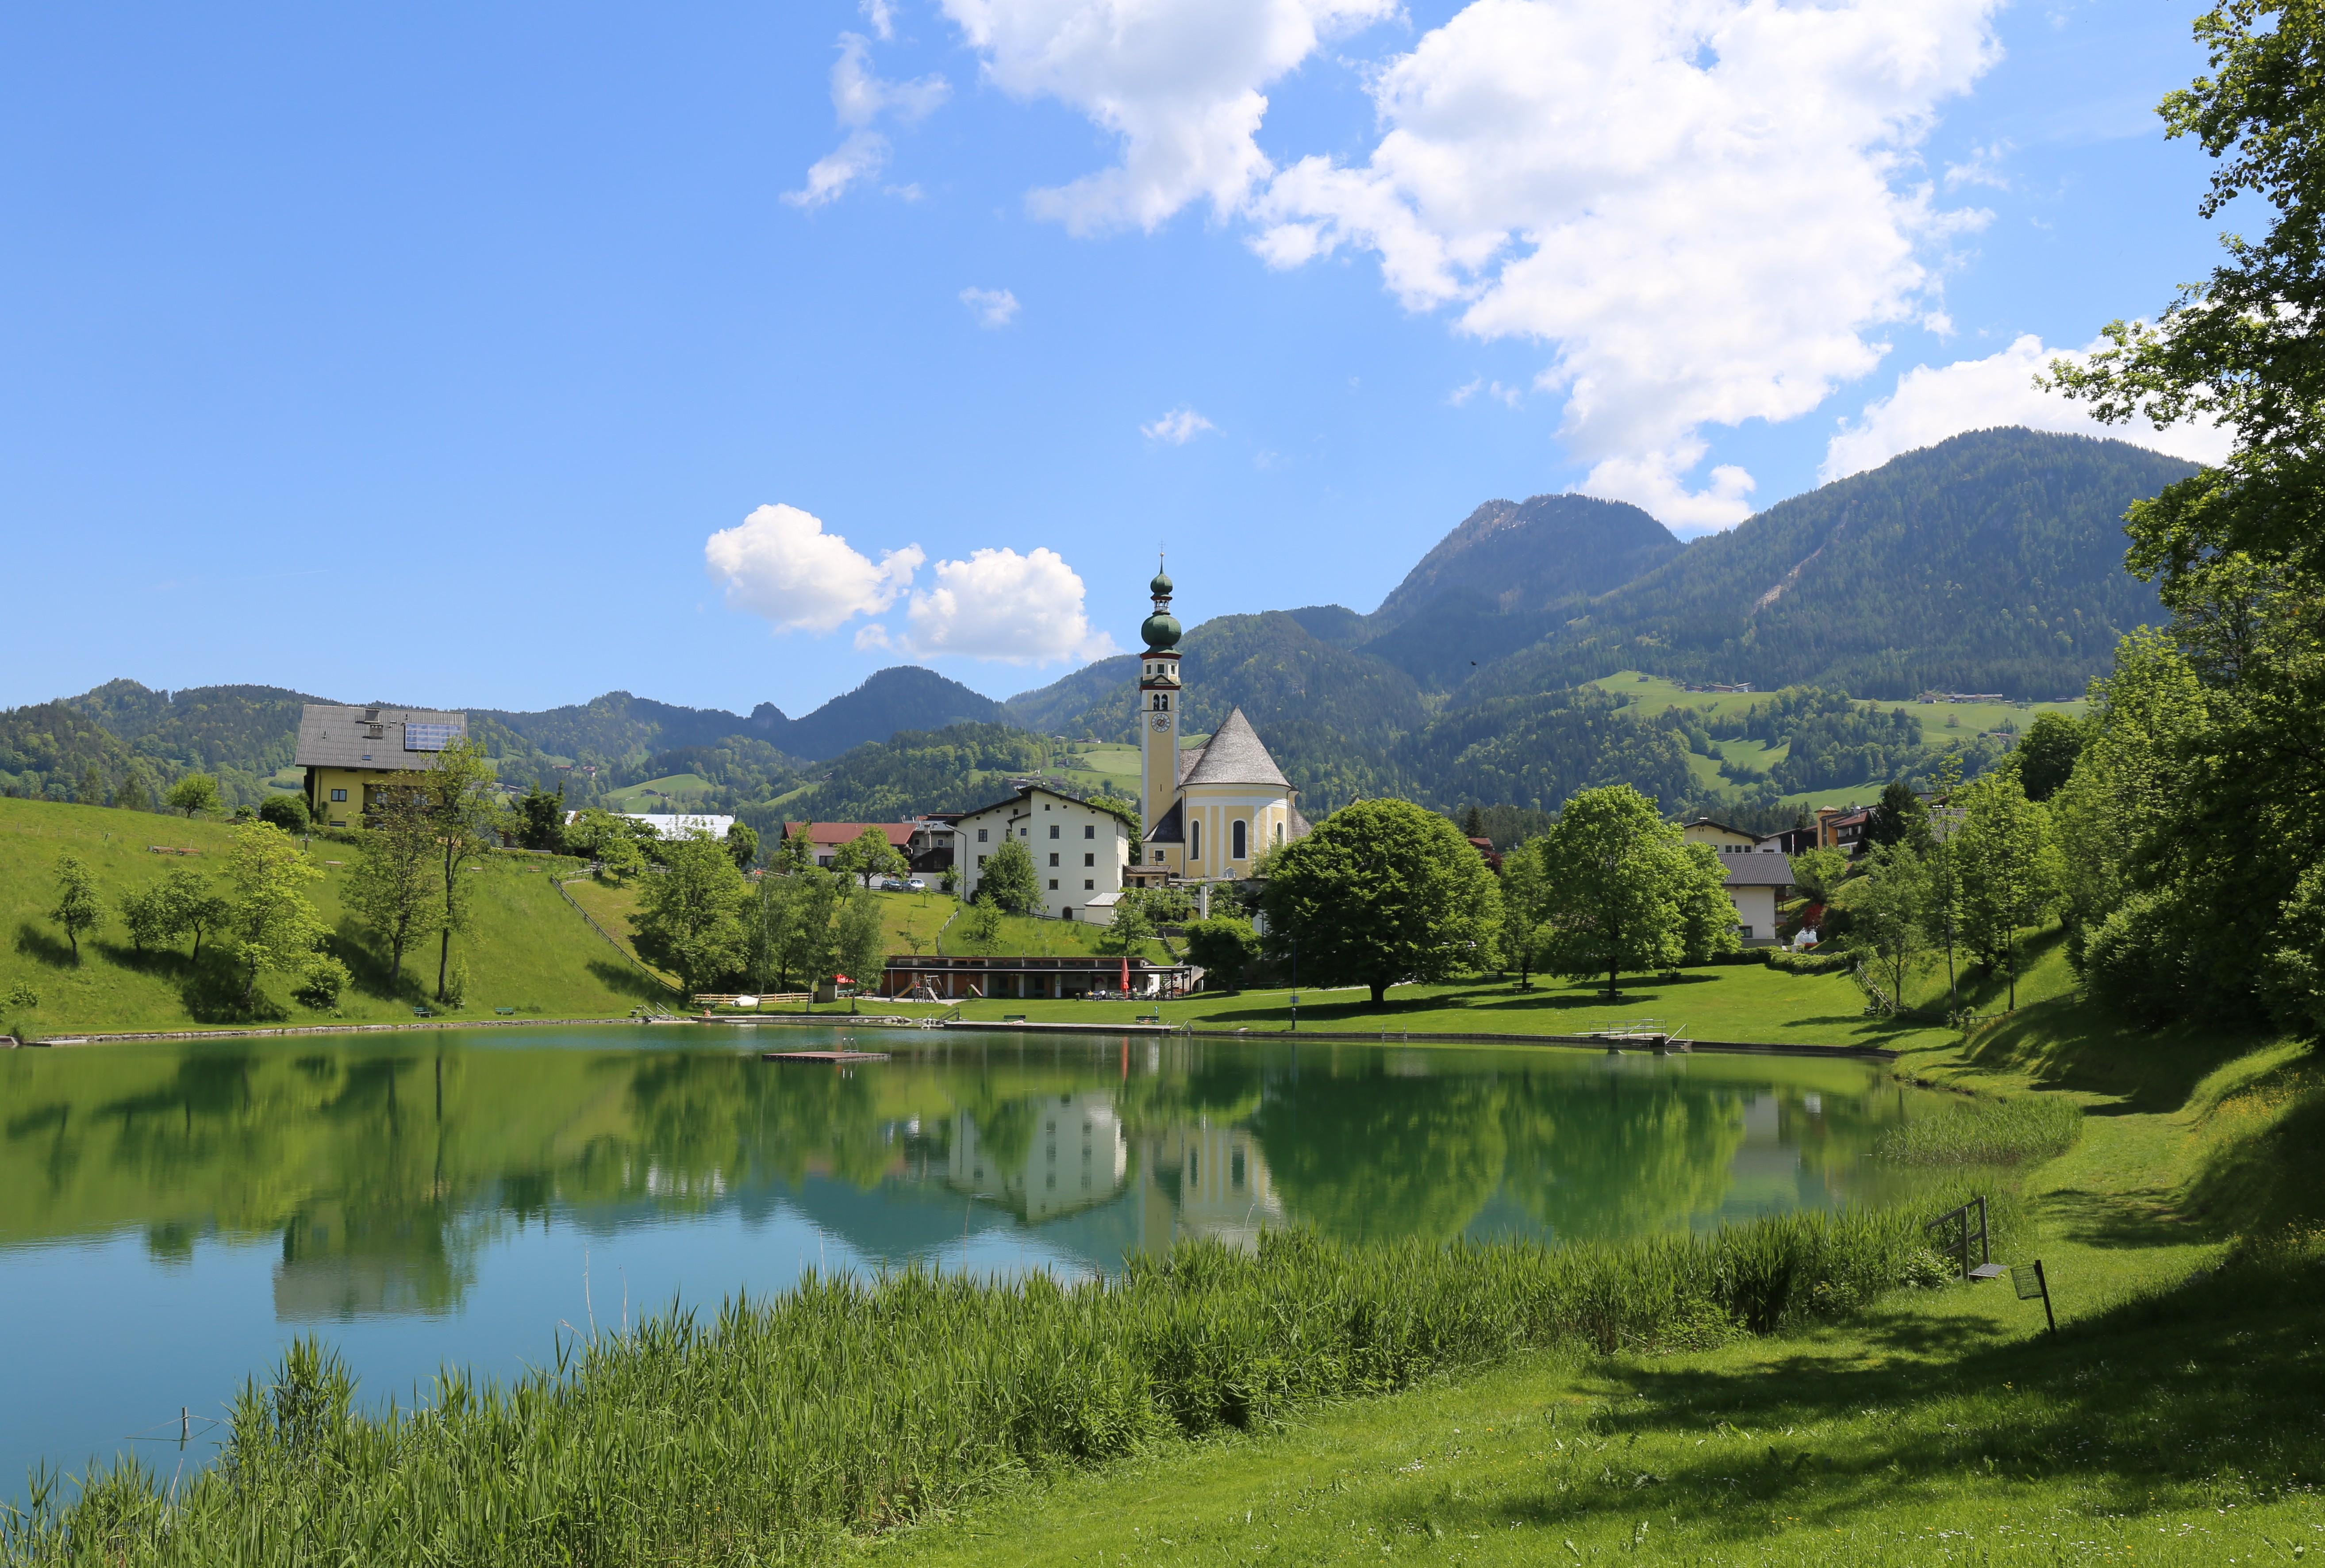 Webcam in Reith im Alpbachtal | Livecam Reith im Alpbachtal